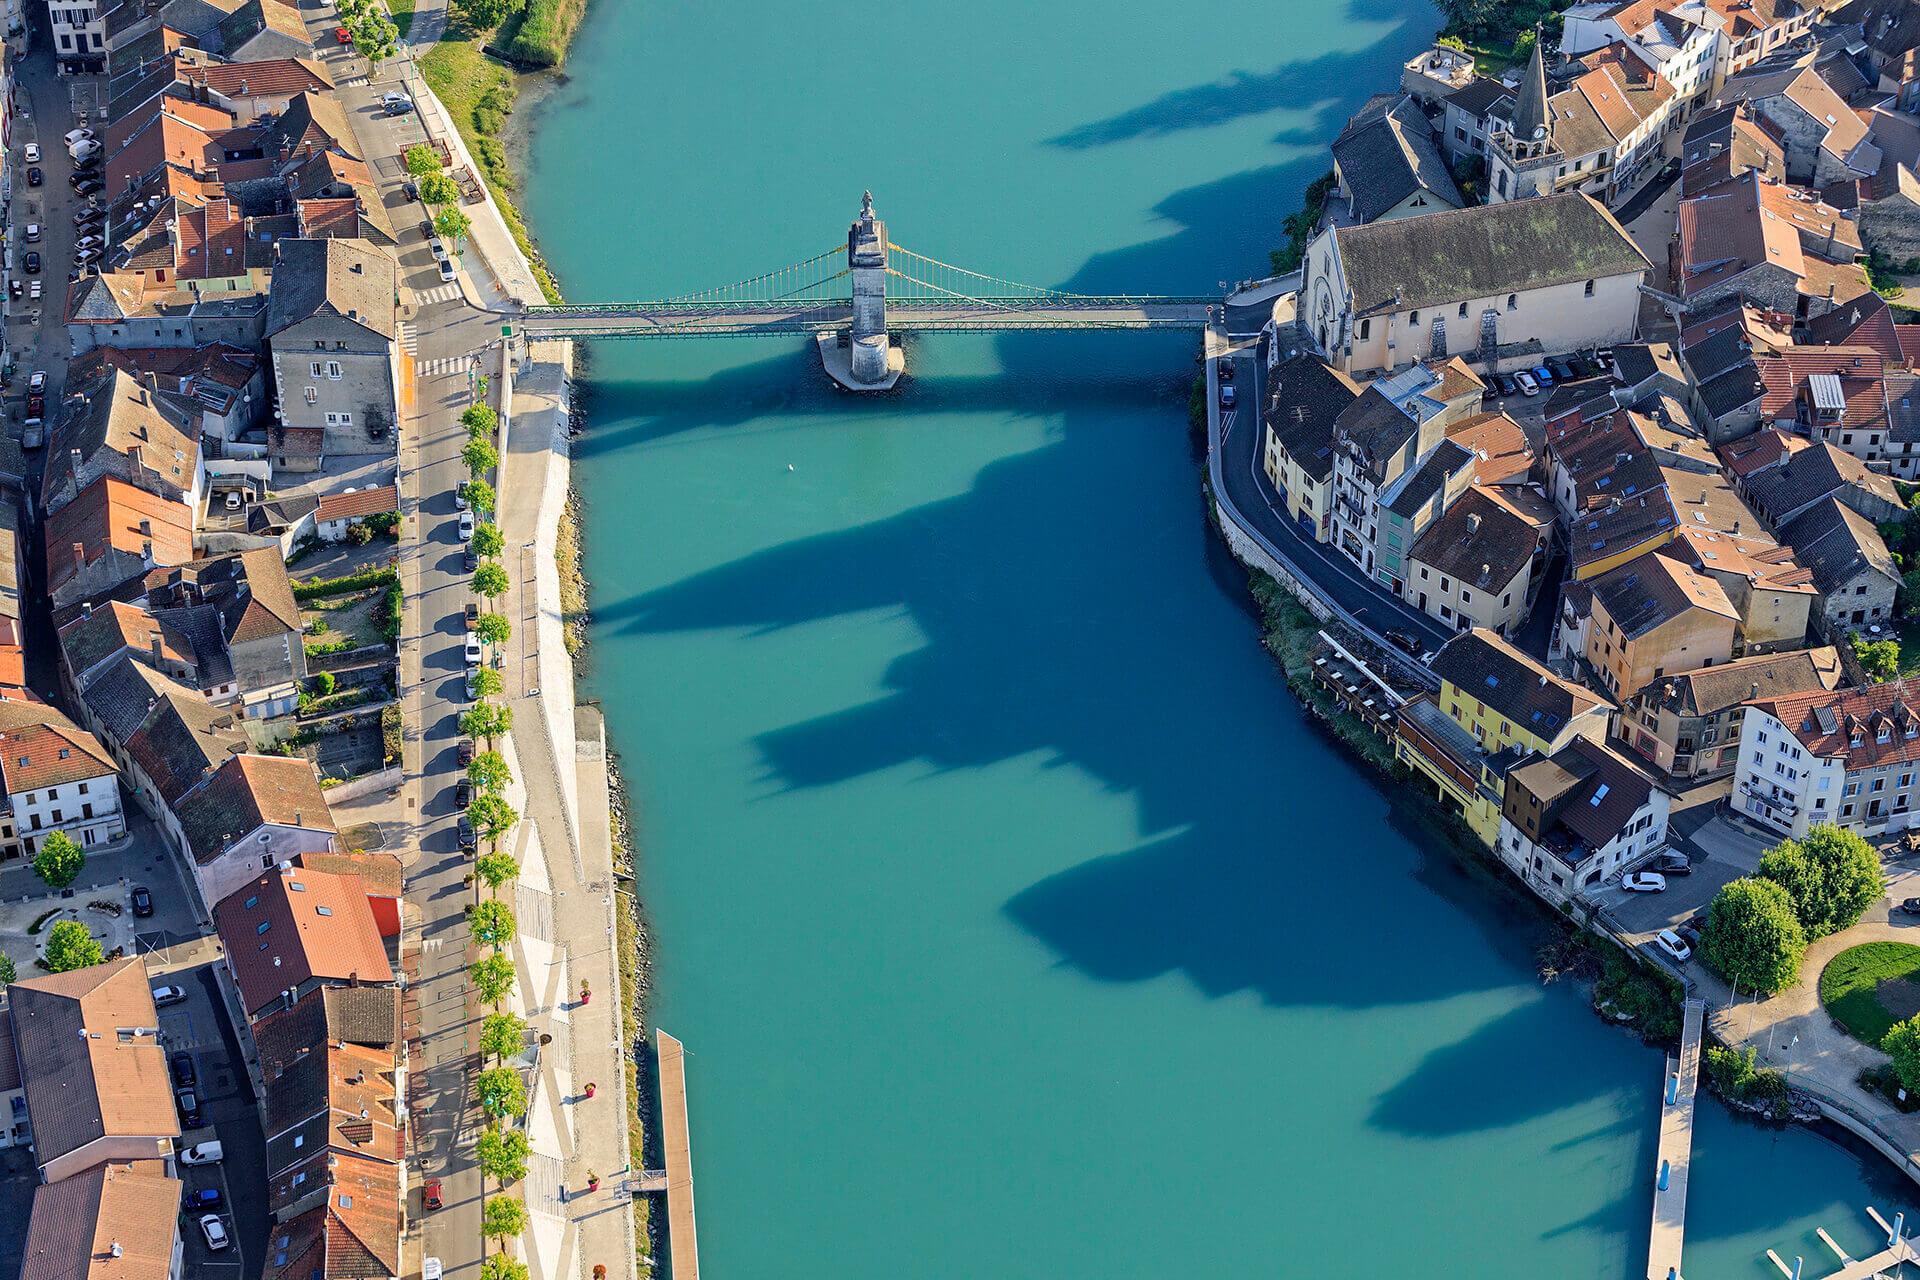 Le fleuve Rhône, Km 303 Ain Seyssel, Haute-Savoie Seyssel